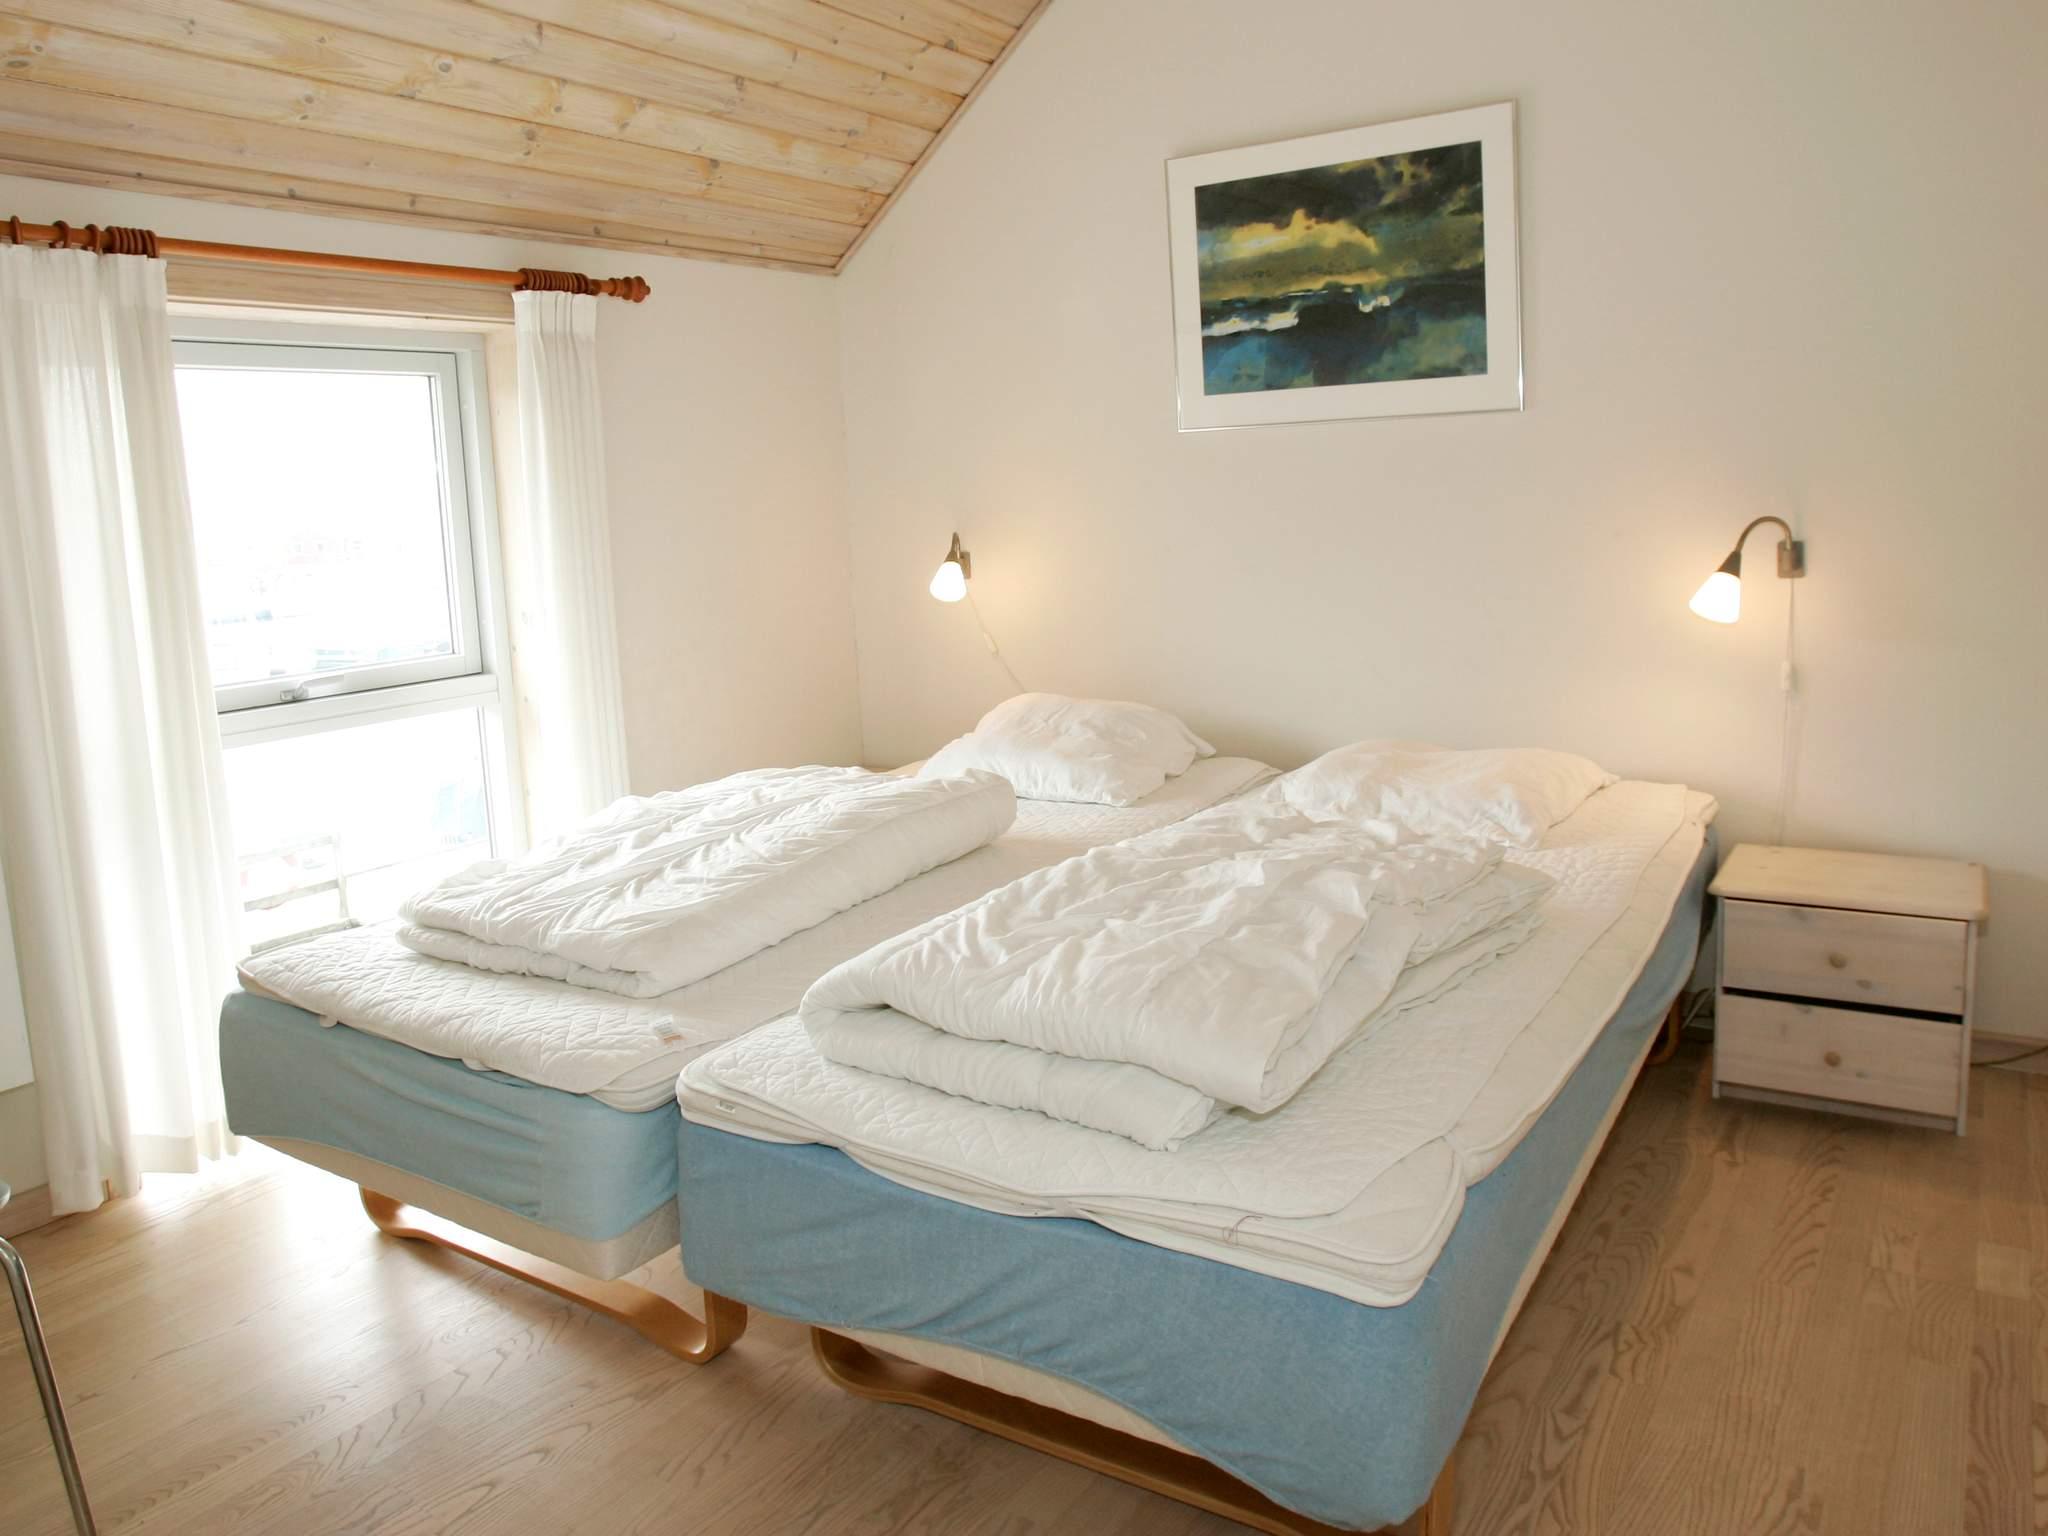 Ferienhaus Hasle (84885), Hasle, , Bornholm, Dänemark, Bild 12